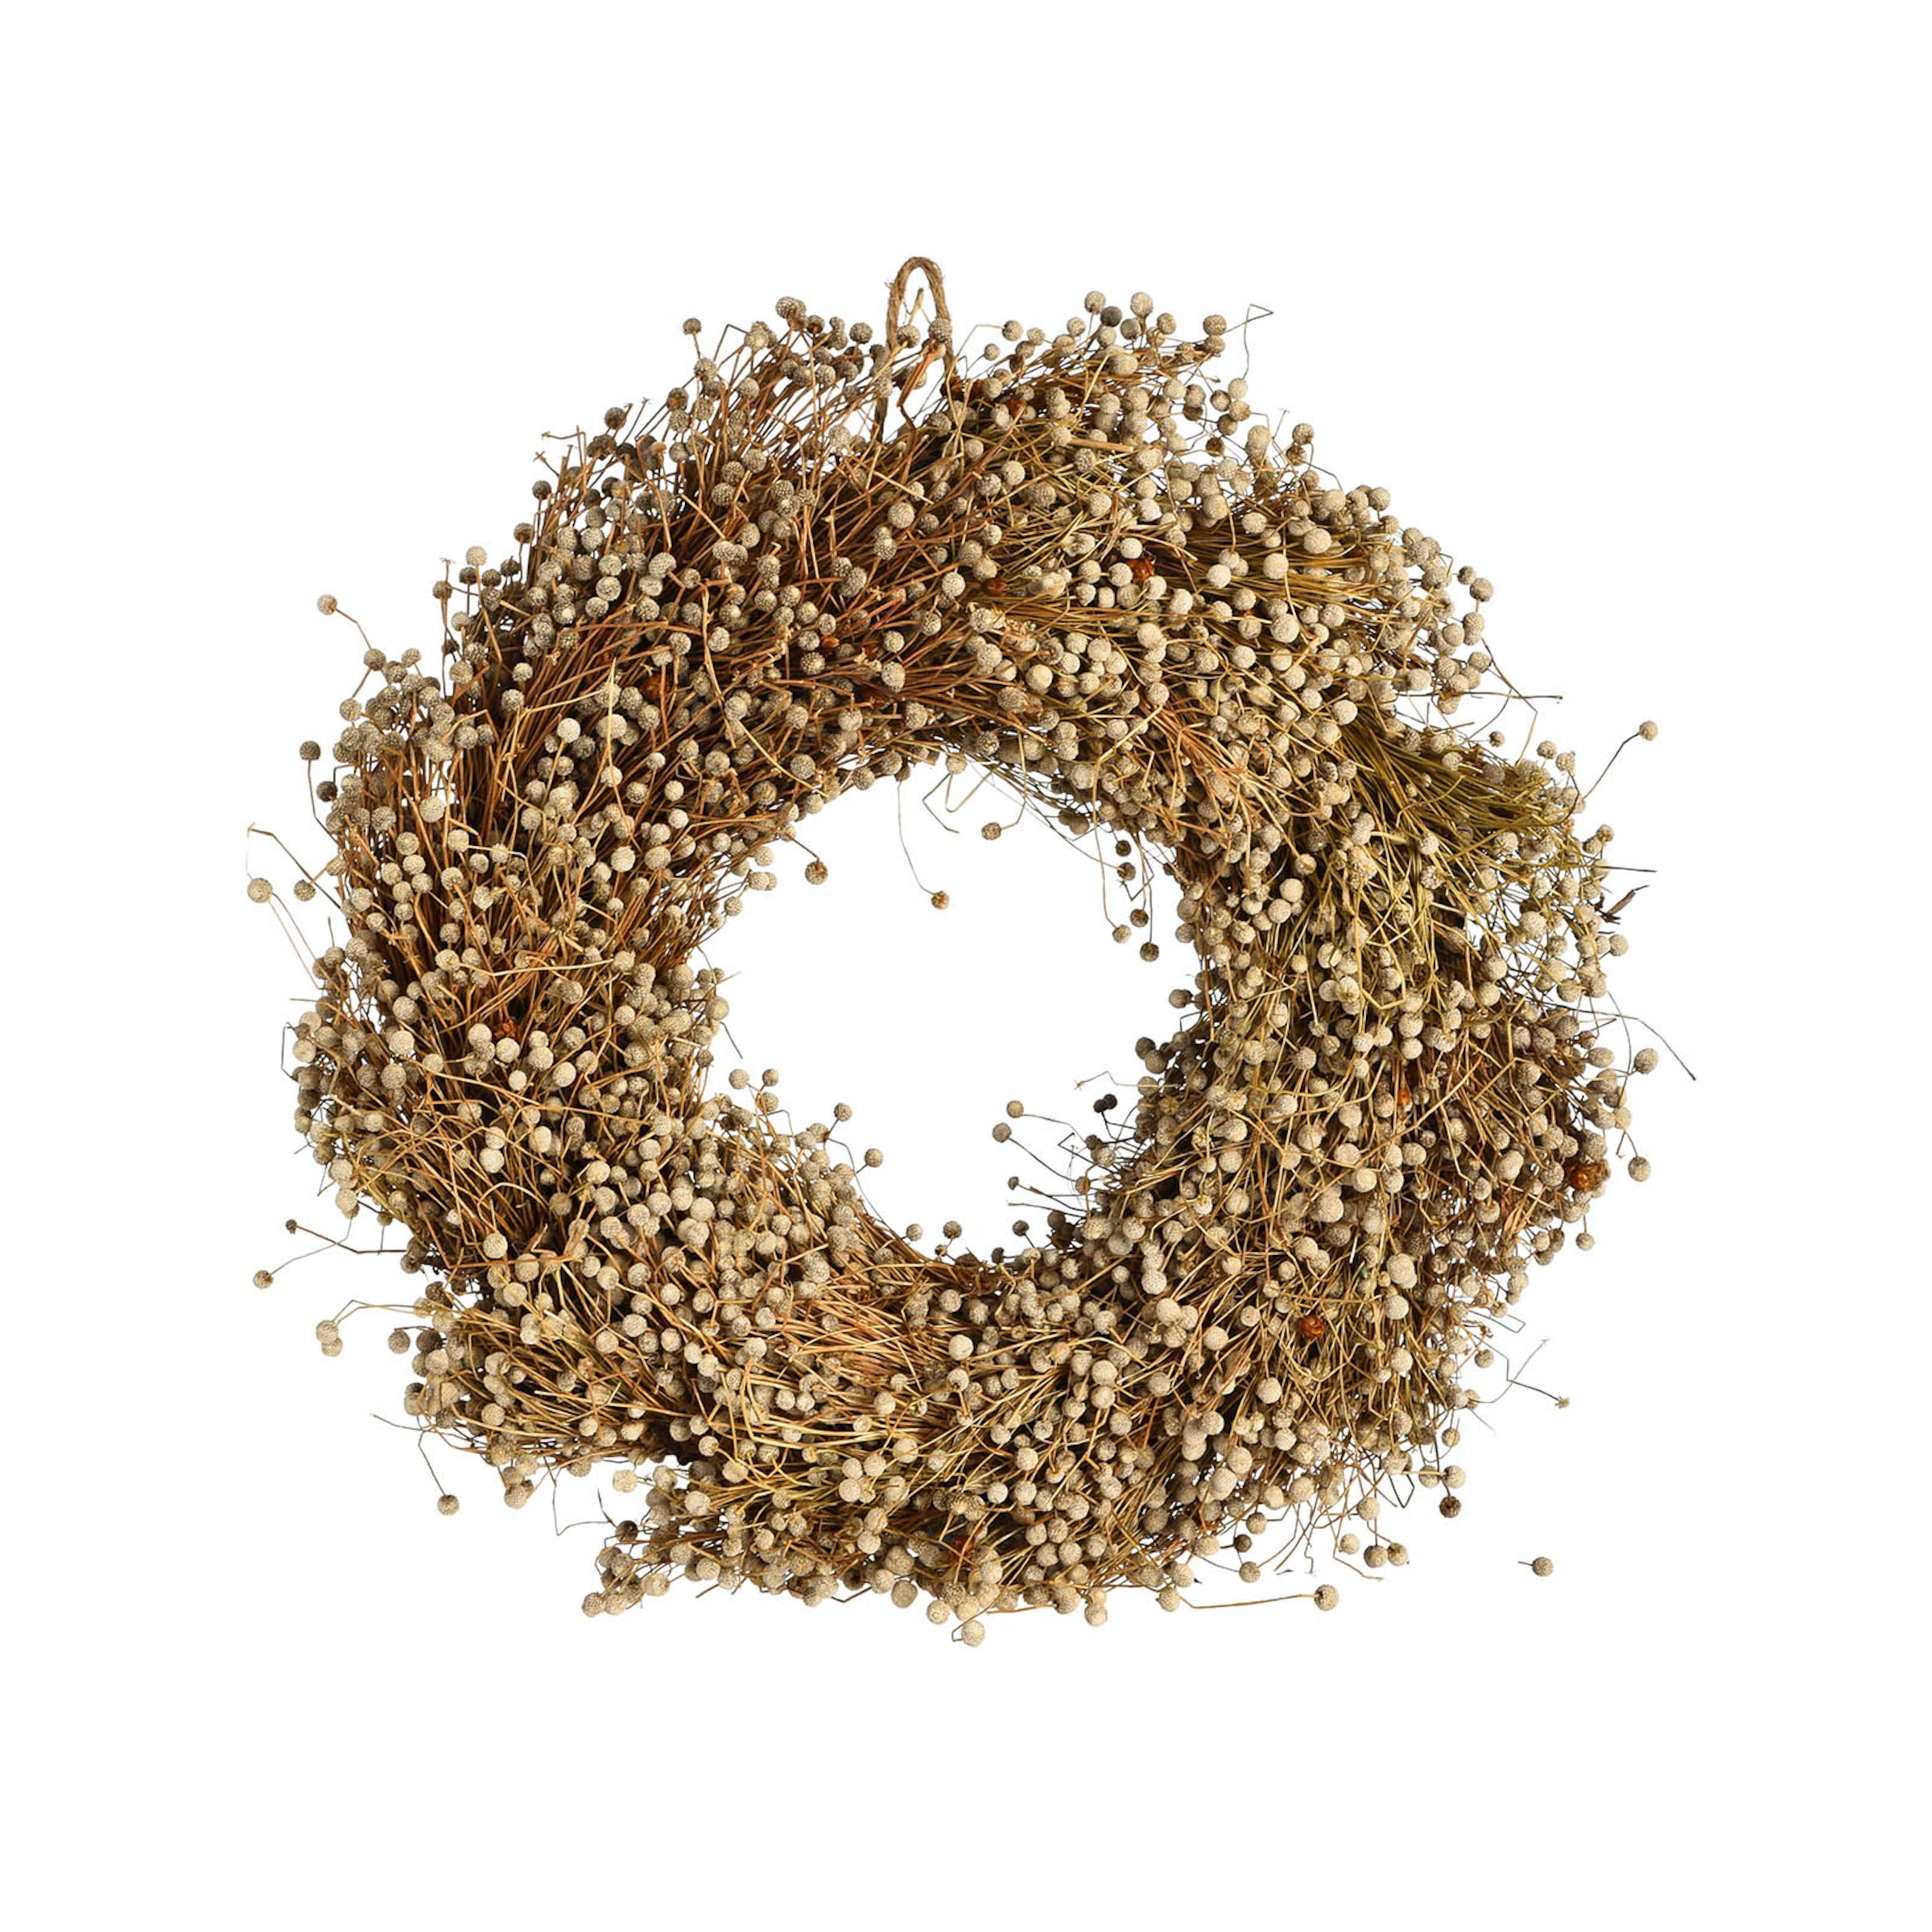 Kranz aus Trockenblumen, D:25cm, natur